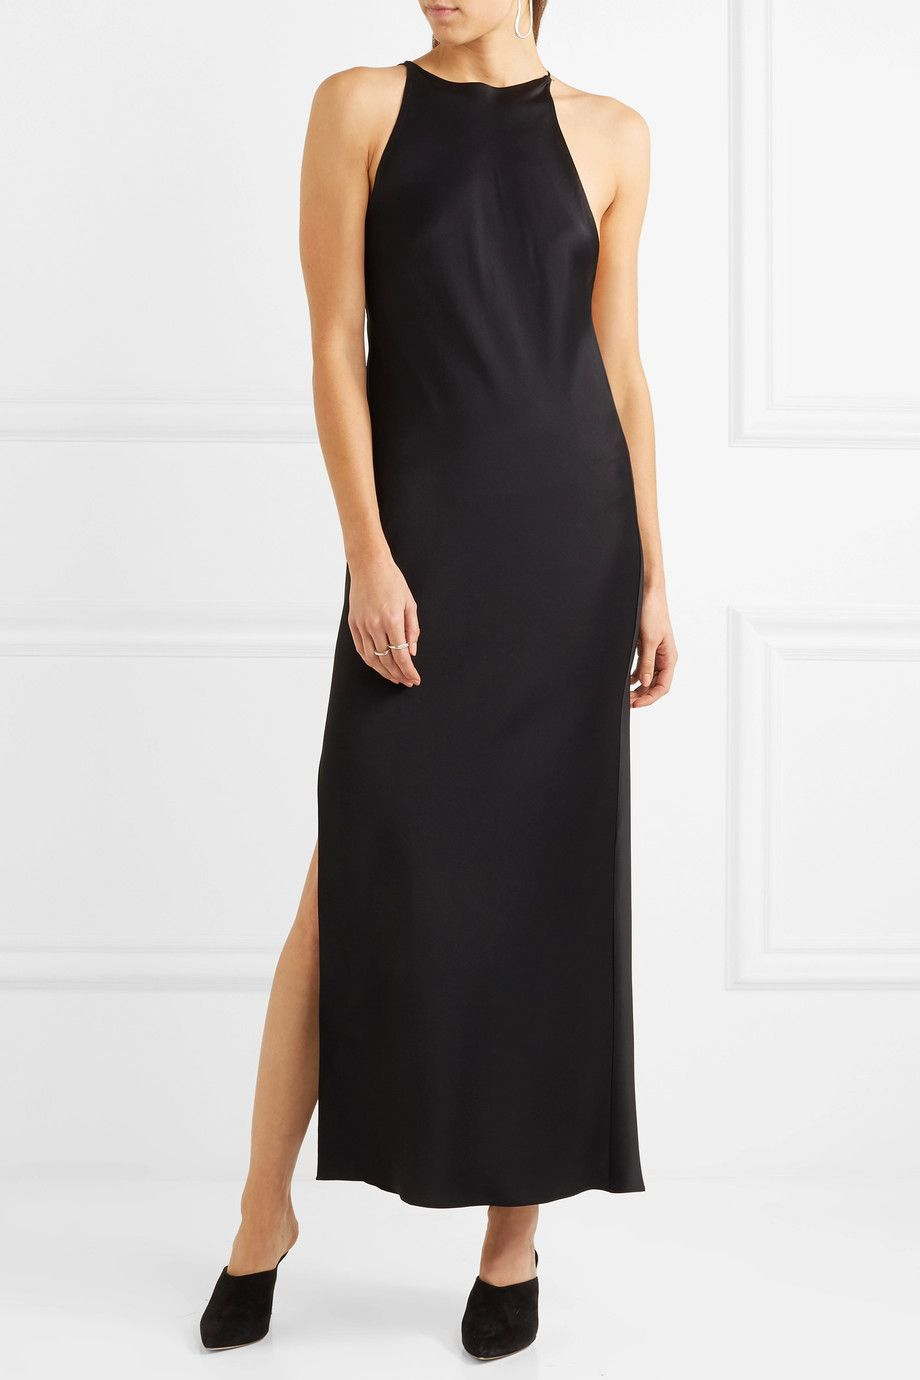 Karen Satin Midi Dress - Black Khaite kWblGOr